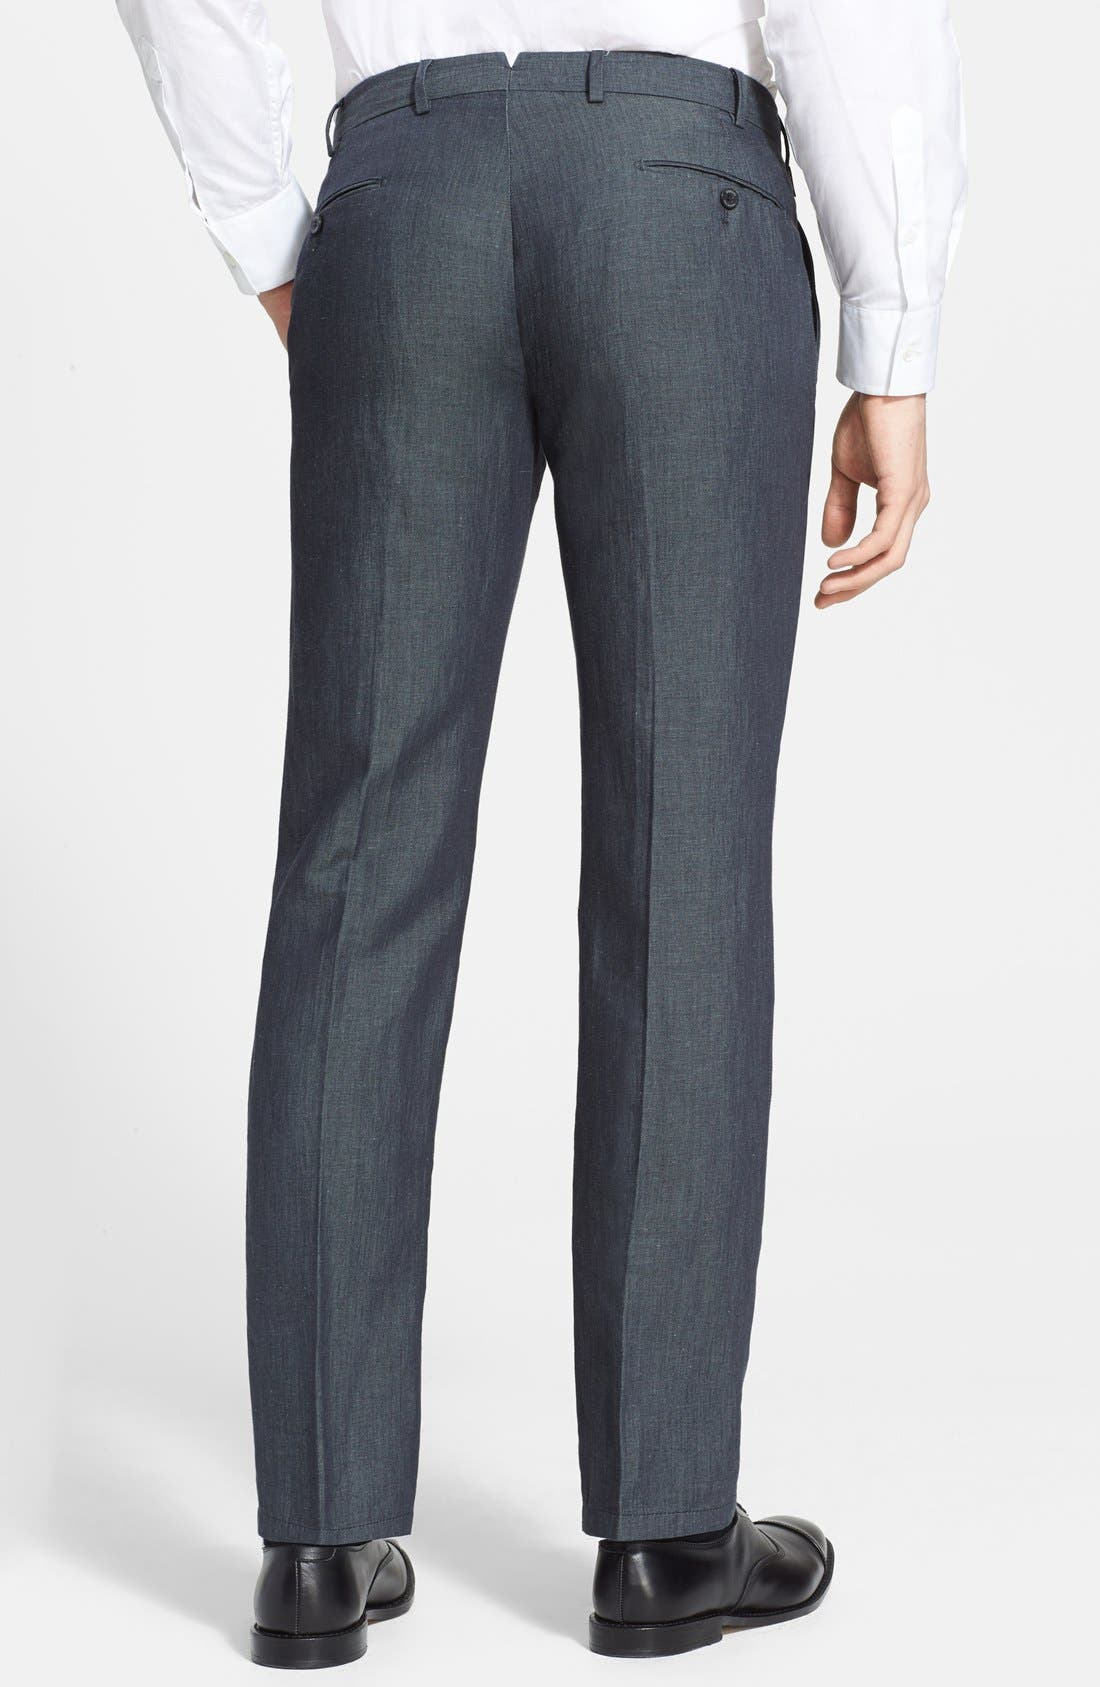 Armani Collezioni Flax & Cotton Flat Front Trousers,                             Alternate thumbnail 3, color,                             034